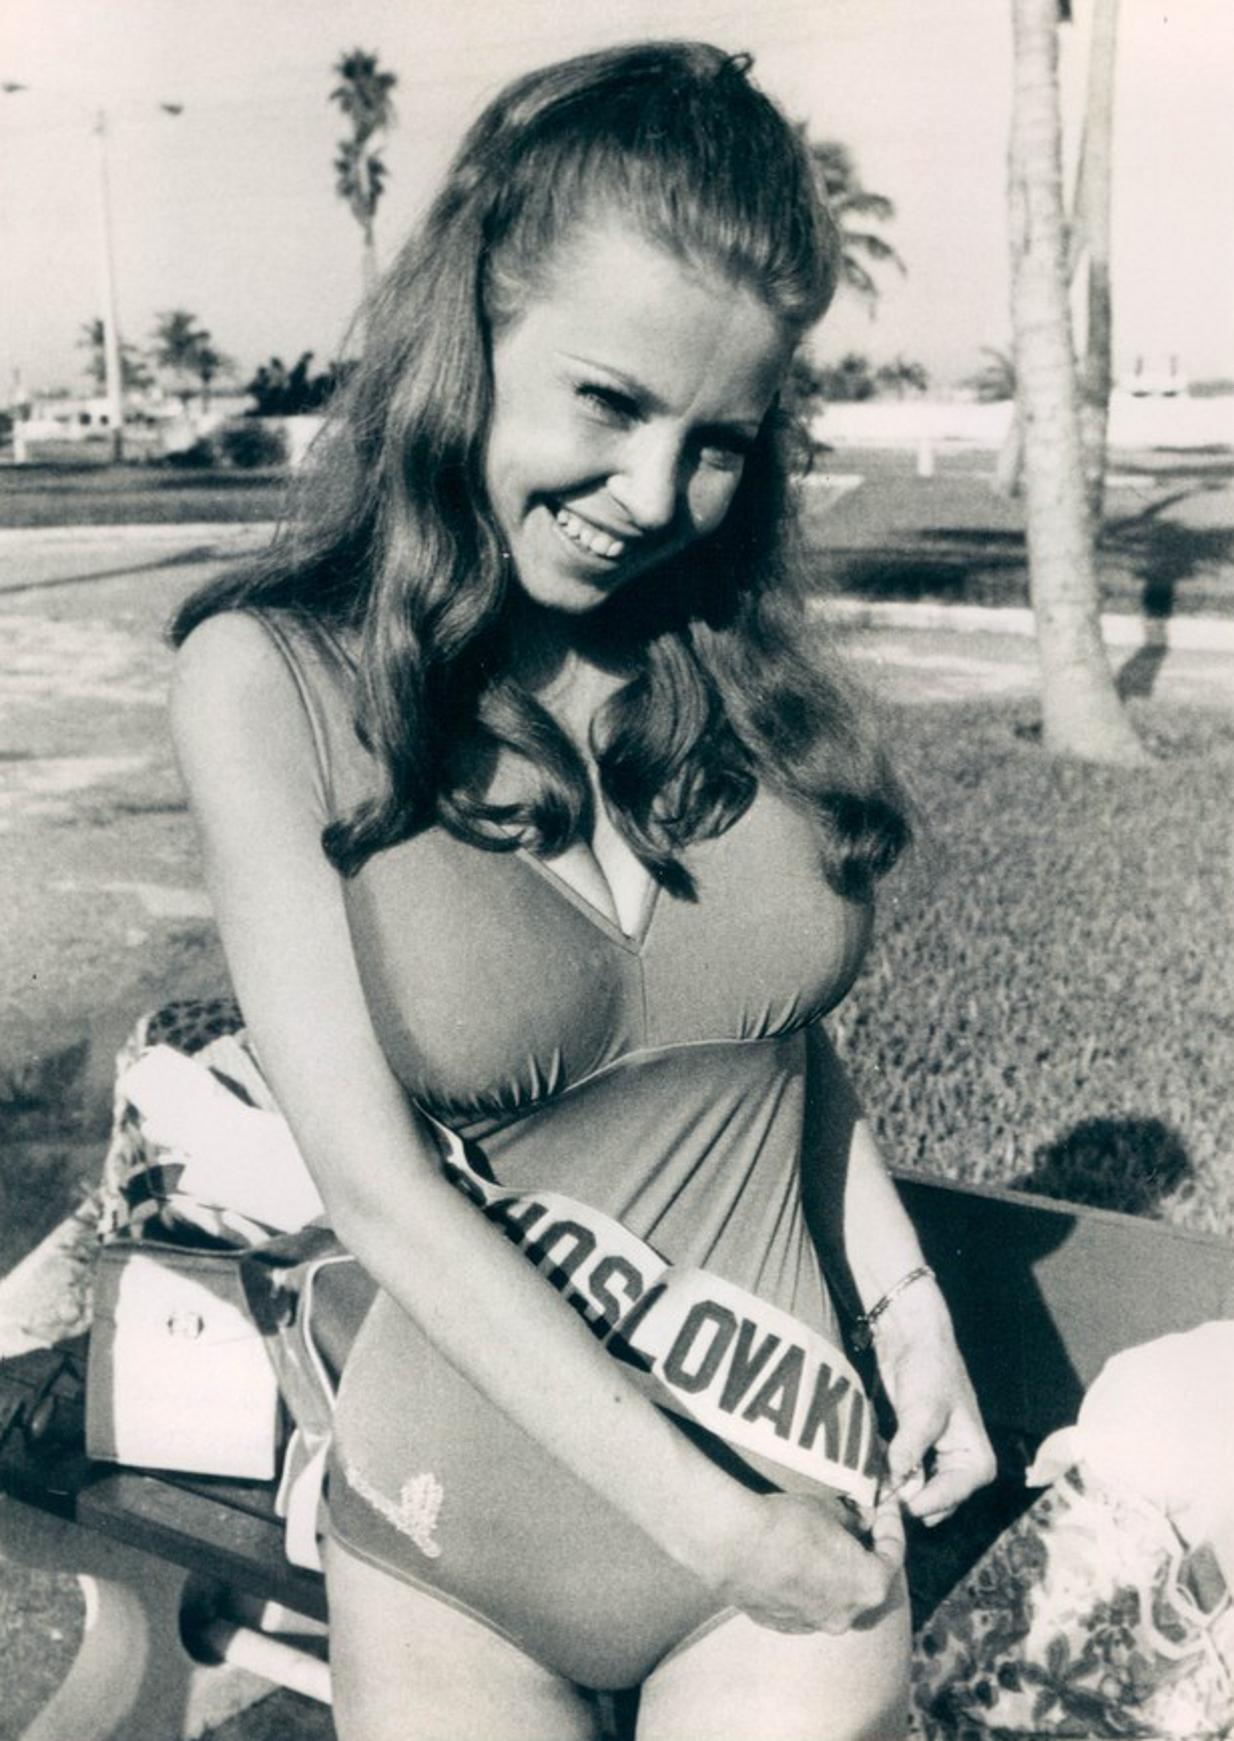 Miss Universe Contestant 1970